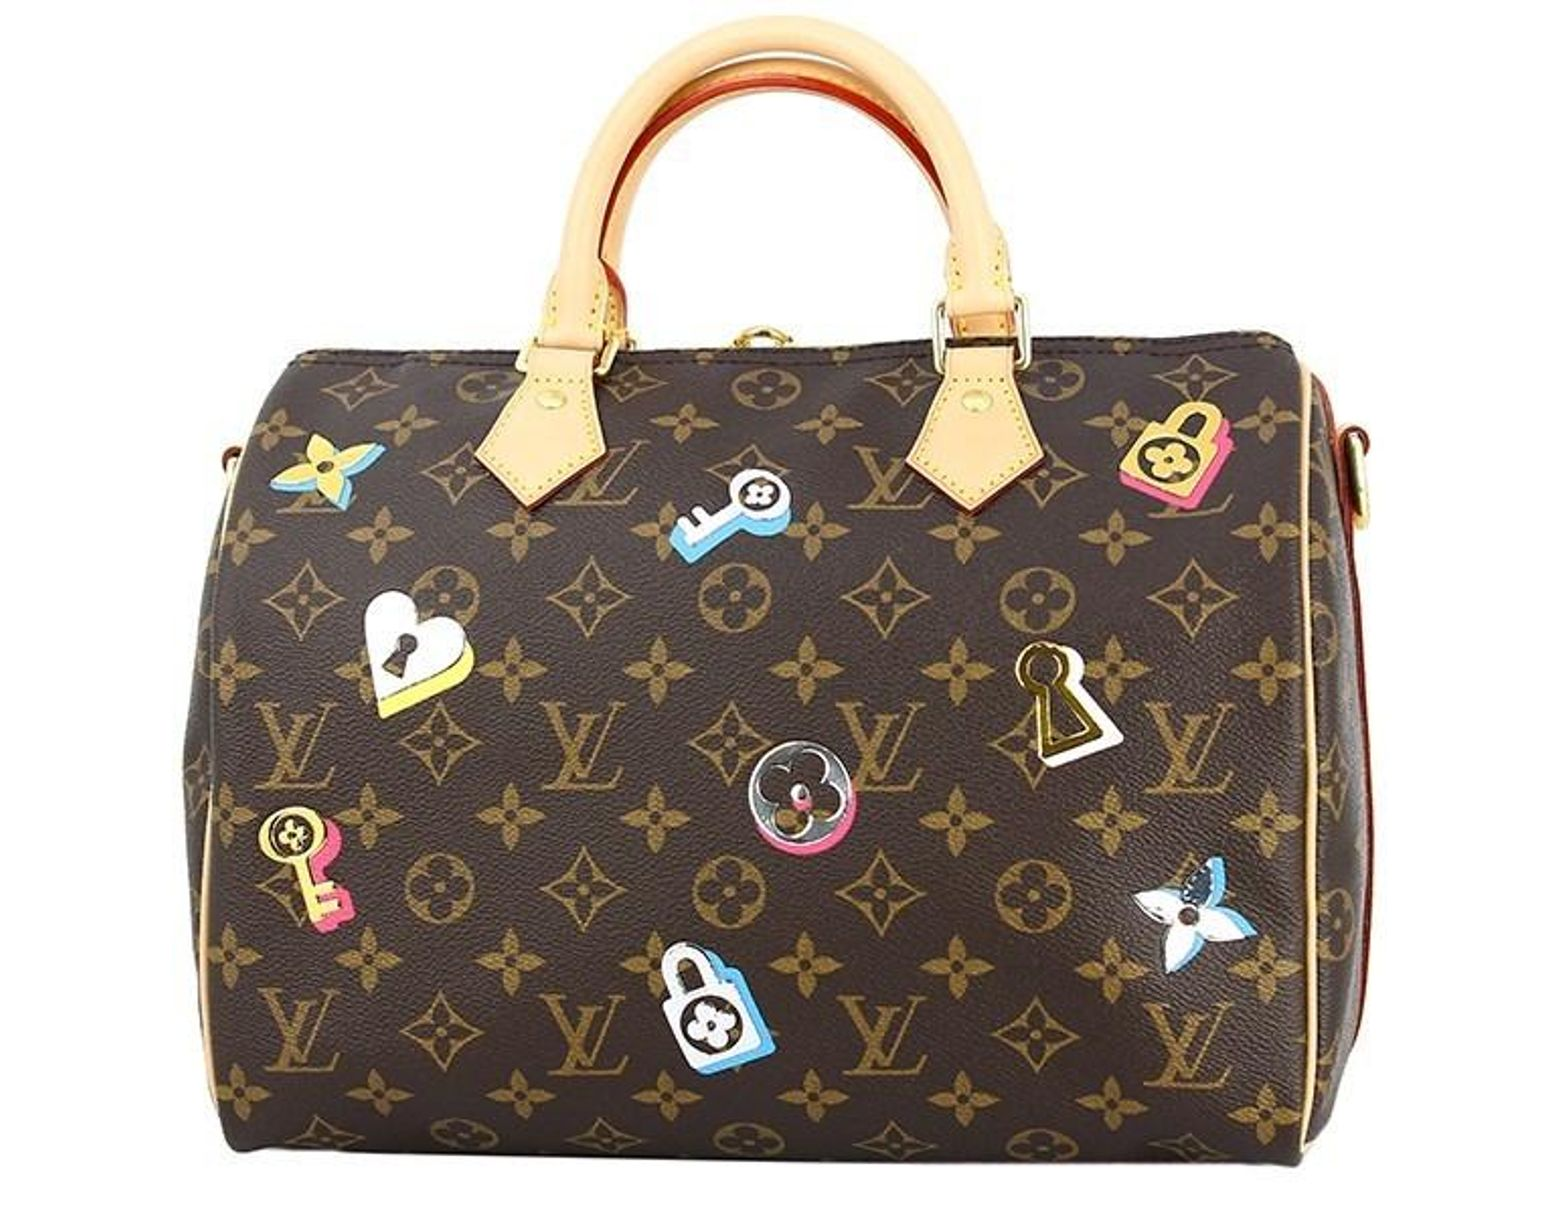 578e199ade7f Lyst - Louis Vuitton Speedy Bandouliere 30 Monogram Love Lock Handbag  Shoulder Bag  new  in Brown